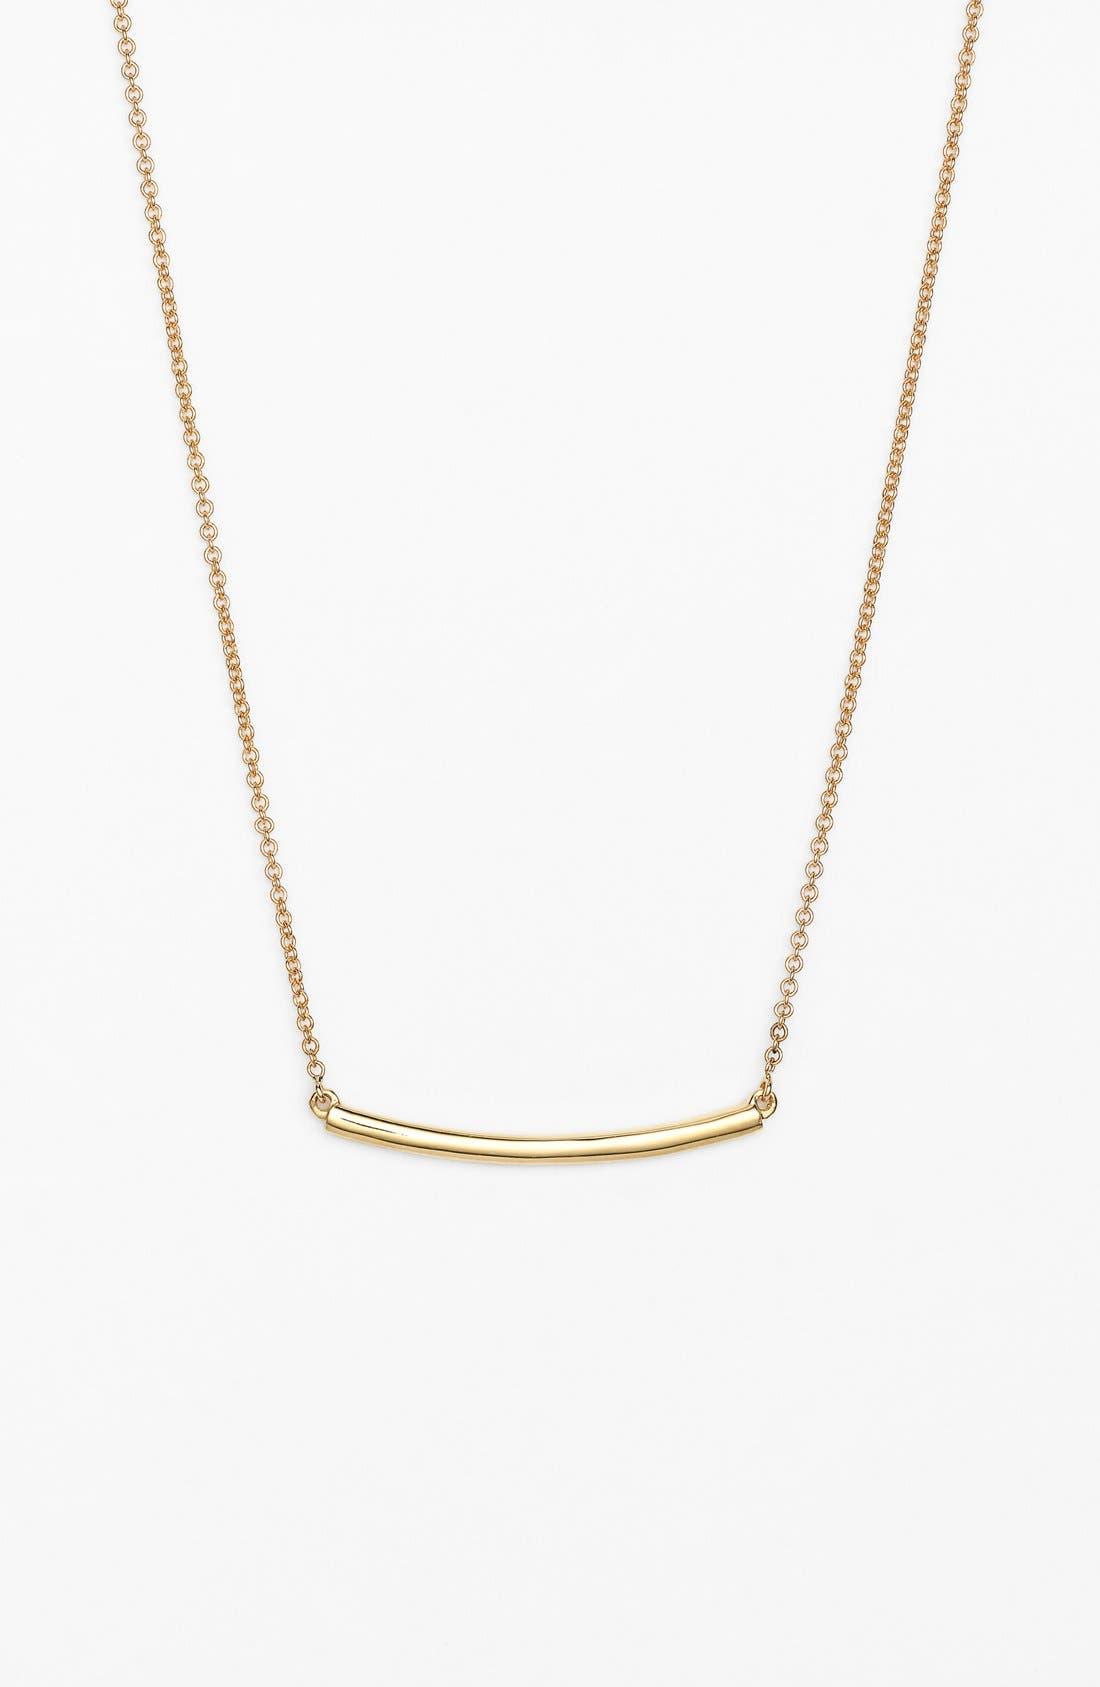 BONY LEVY Bar Pendant Necklace